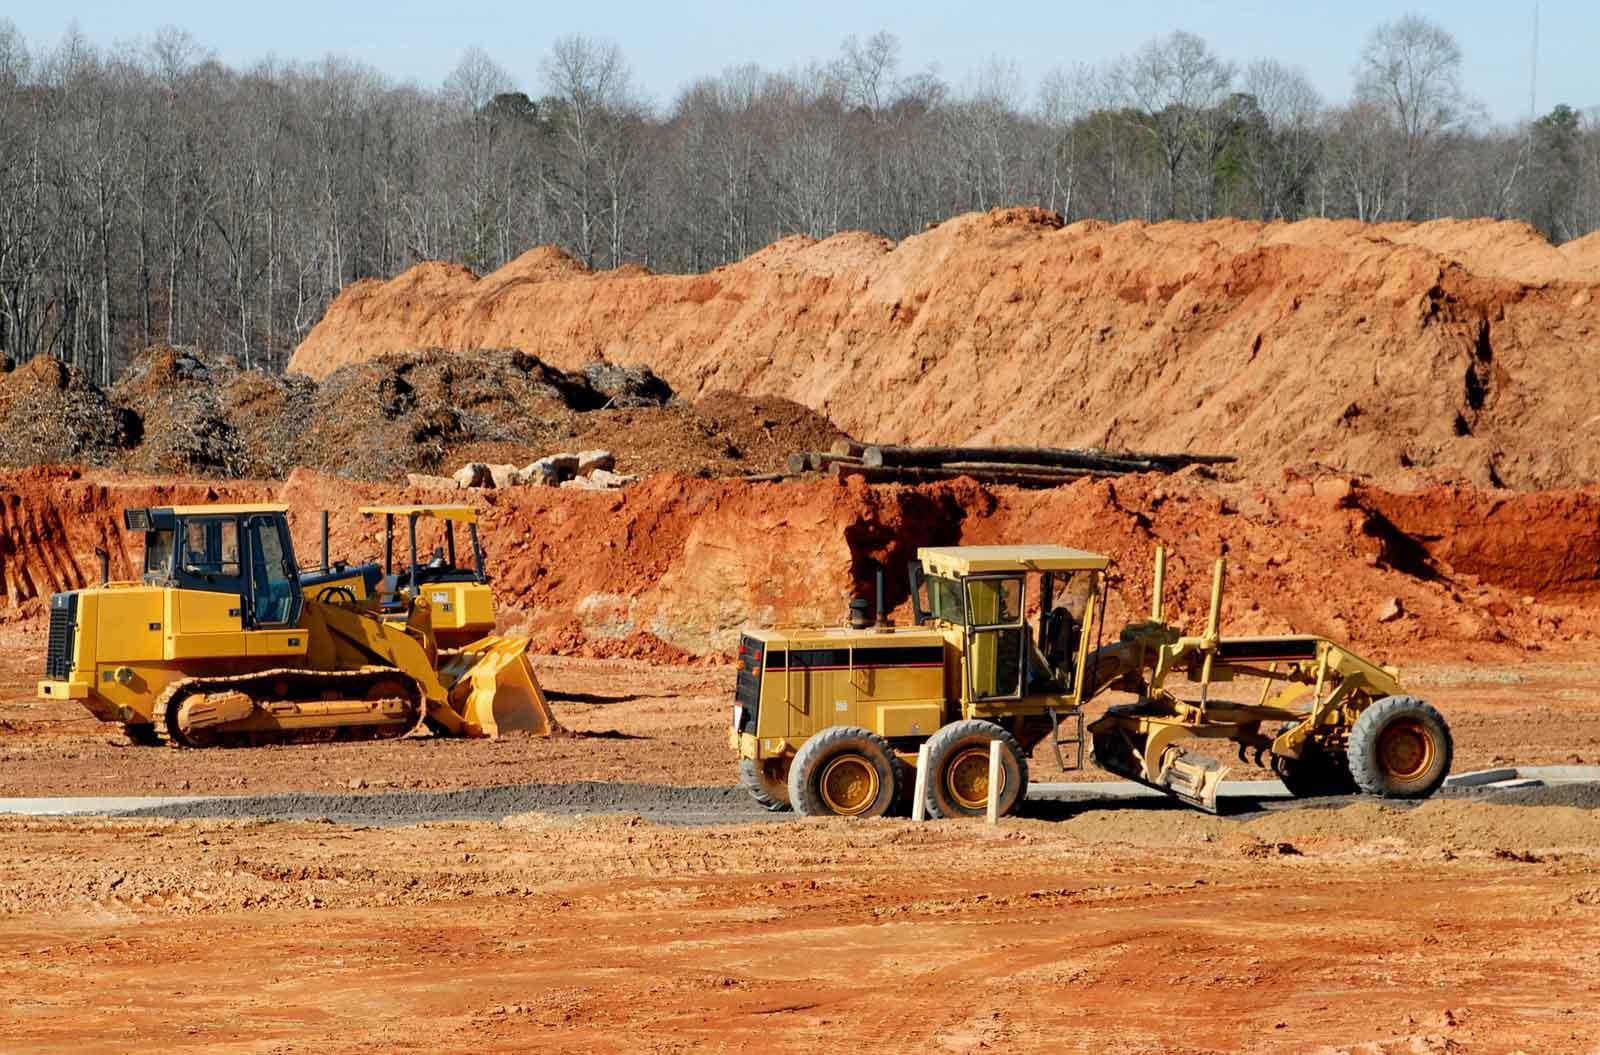 rdprofi-construction-site-1646662_1920